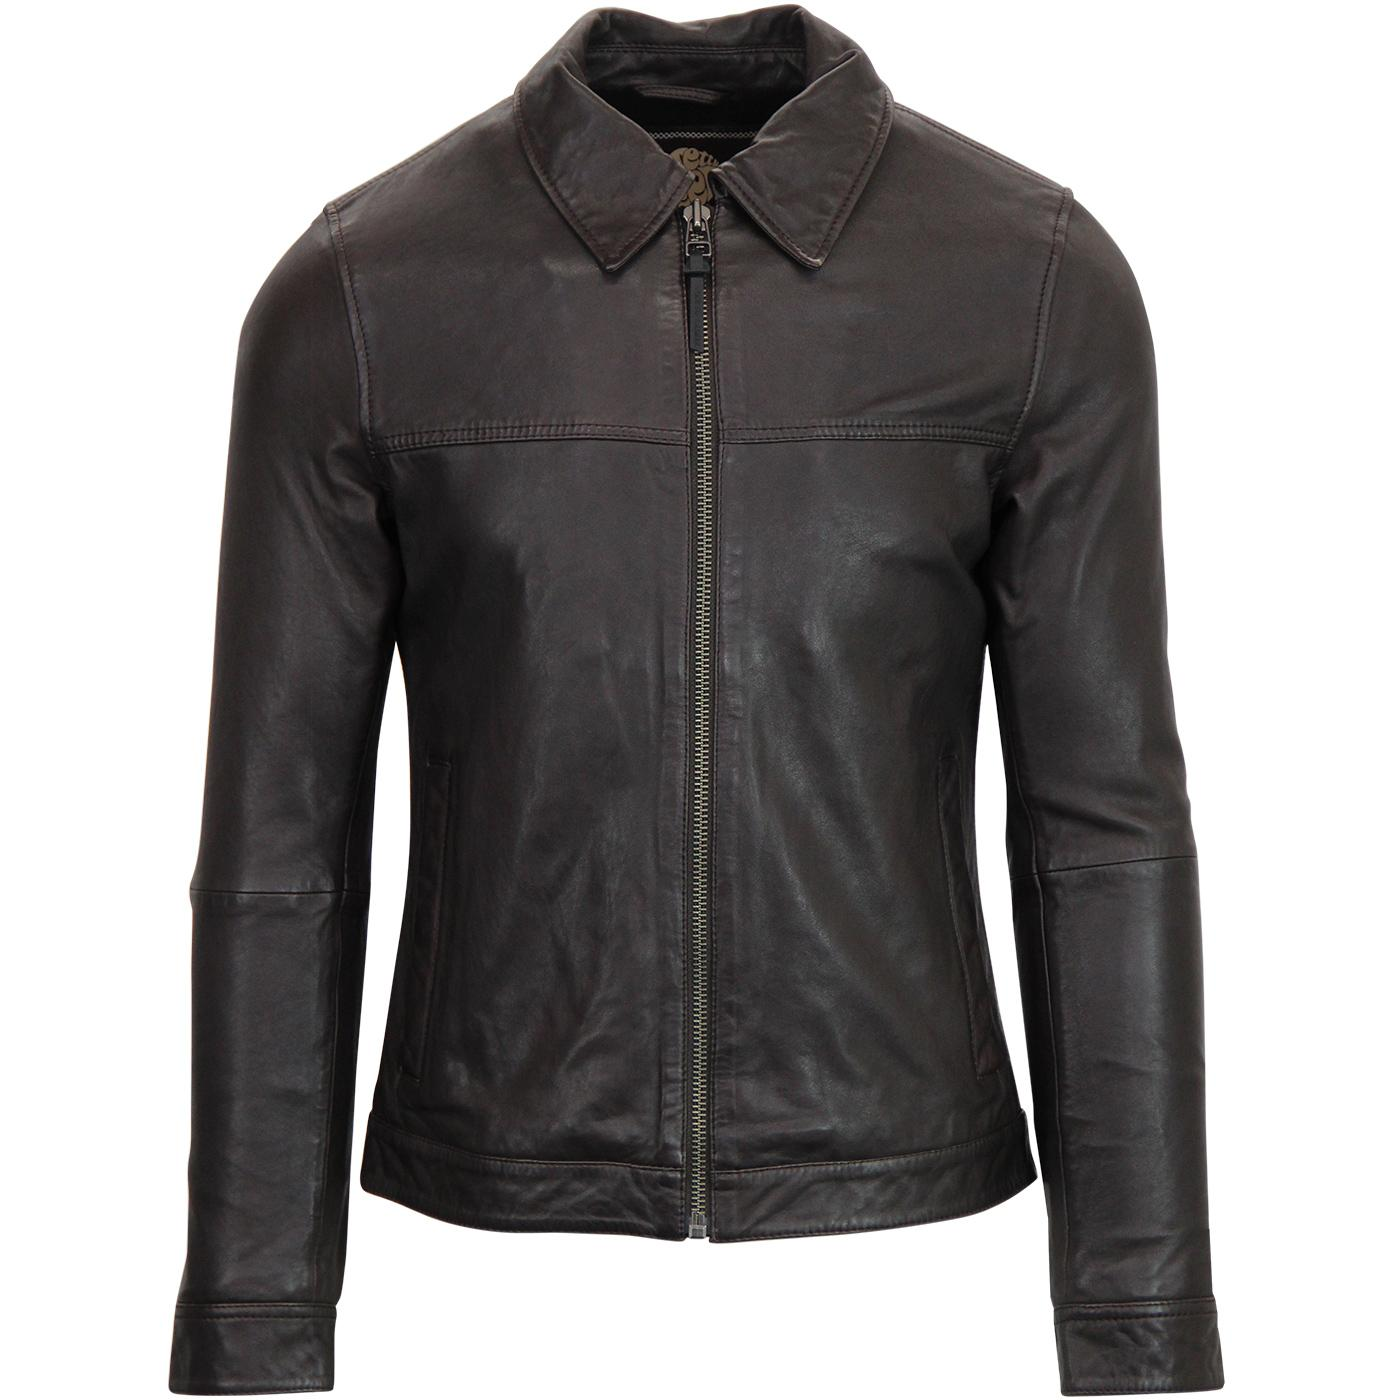 PRETTY GREEN Retro Mod Leather Harrington Jacket